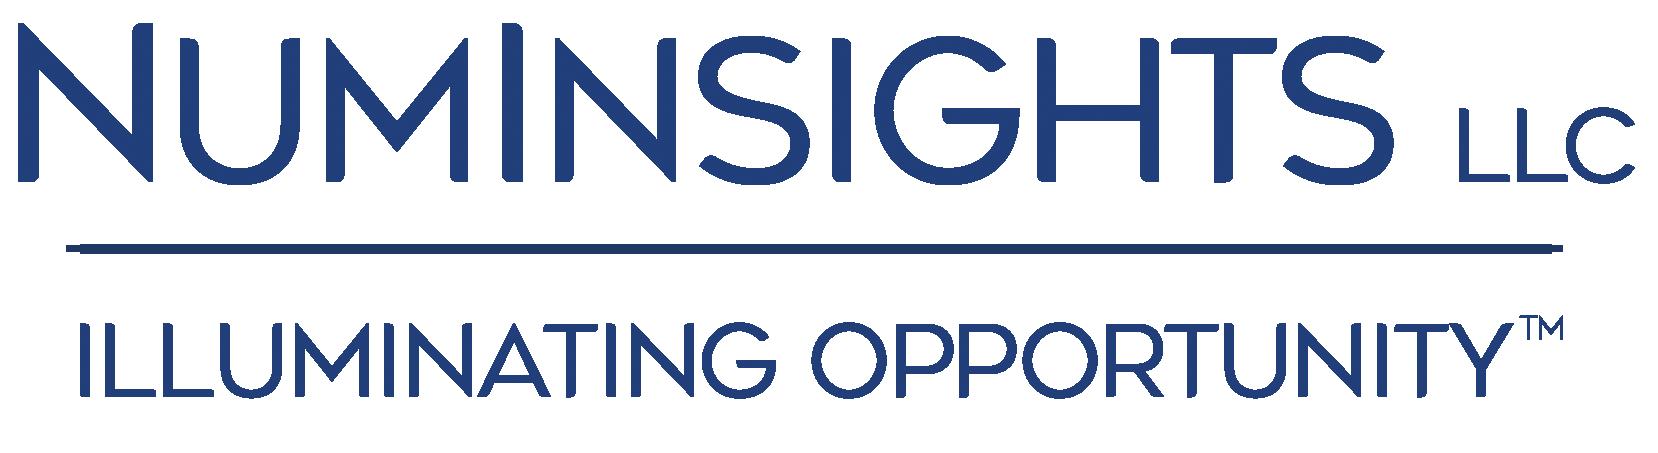 NUMINSIGHTS Logo